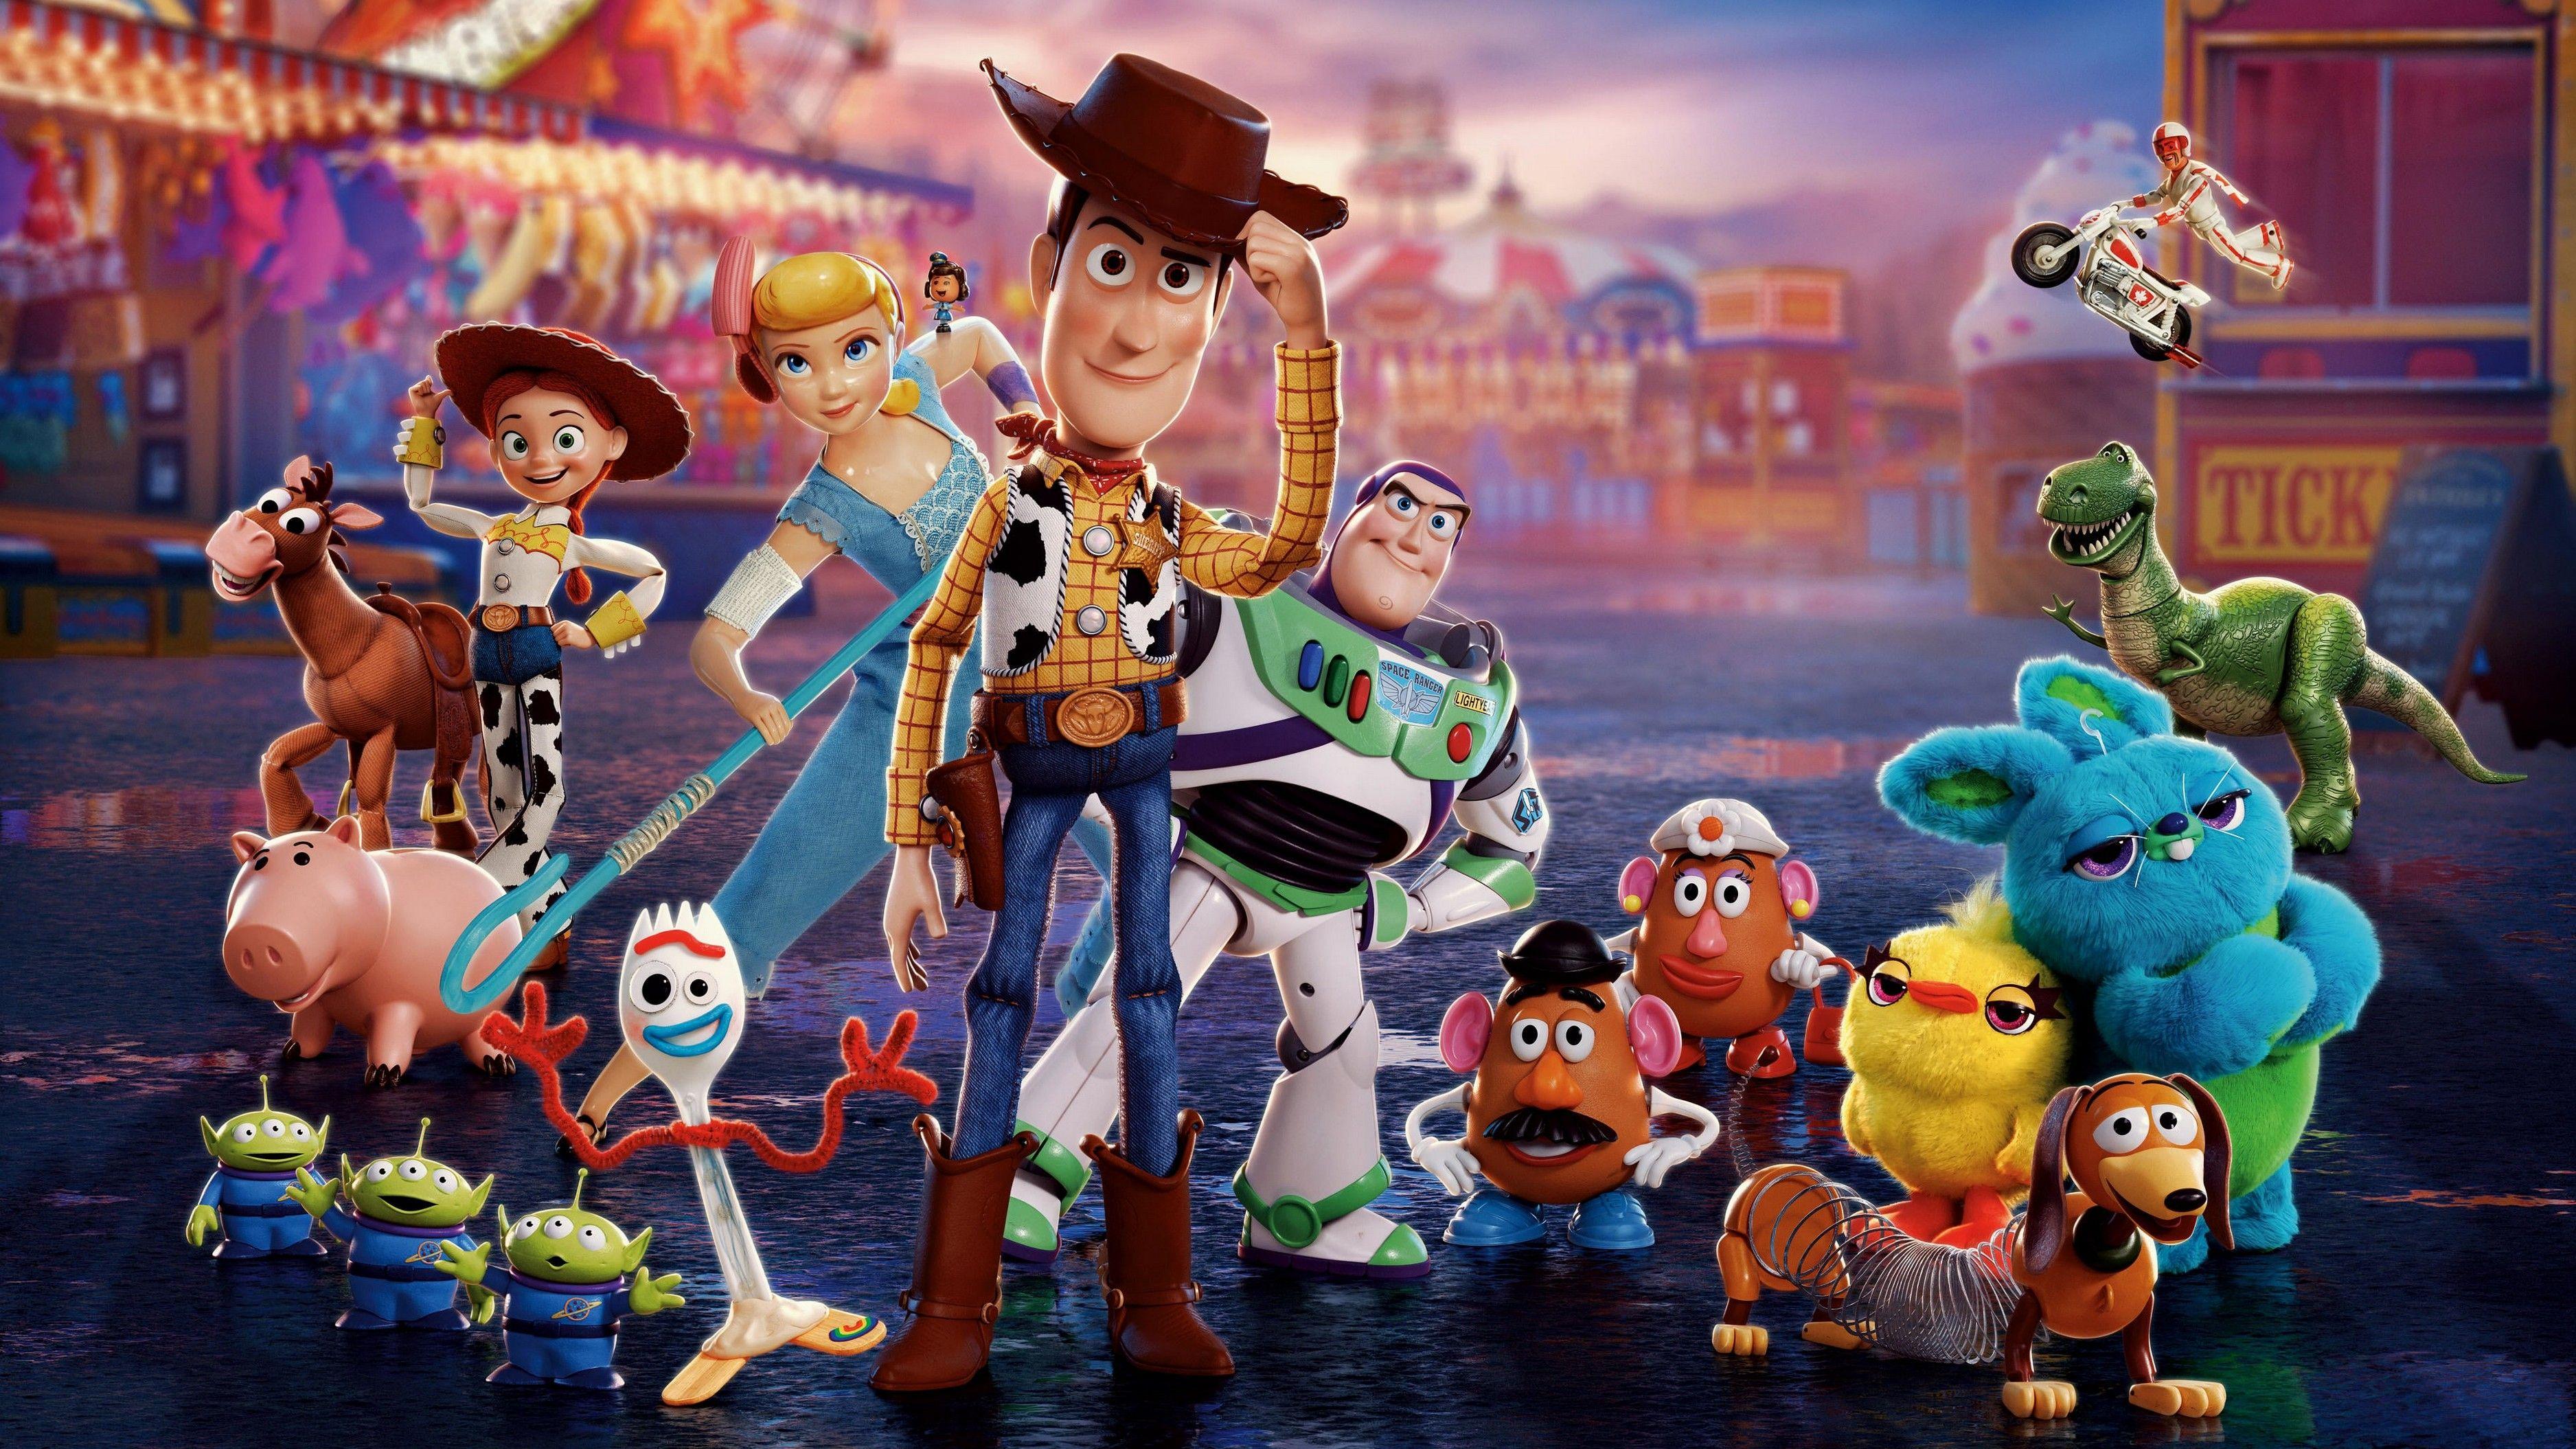 La Toy Story 4 Pelicula Completa En Espanol Latino Descargar Pelicula Toy Story Peliculas De Disney Cumple Toy Story